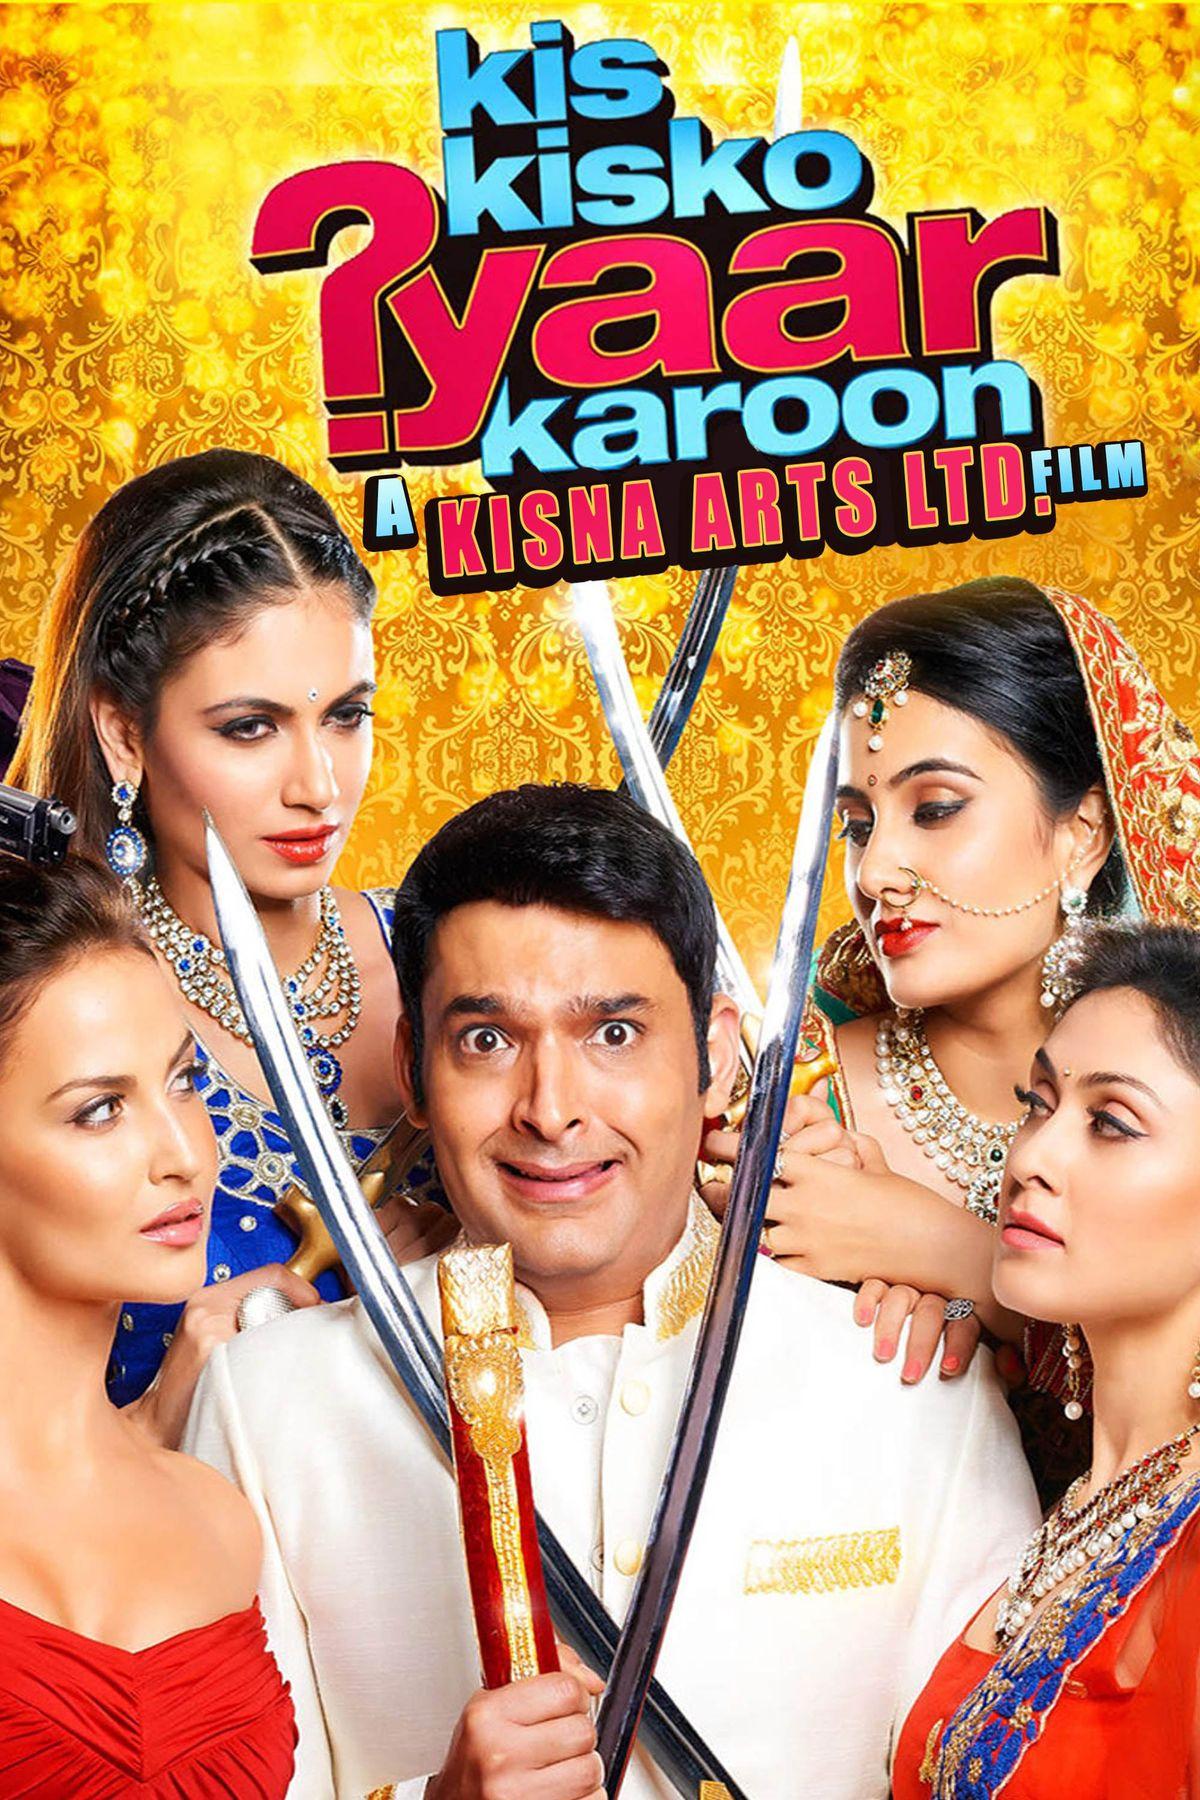 Kapil Sharma Best Movies, TV Shows and Web Series List